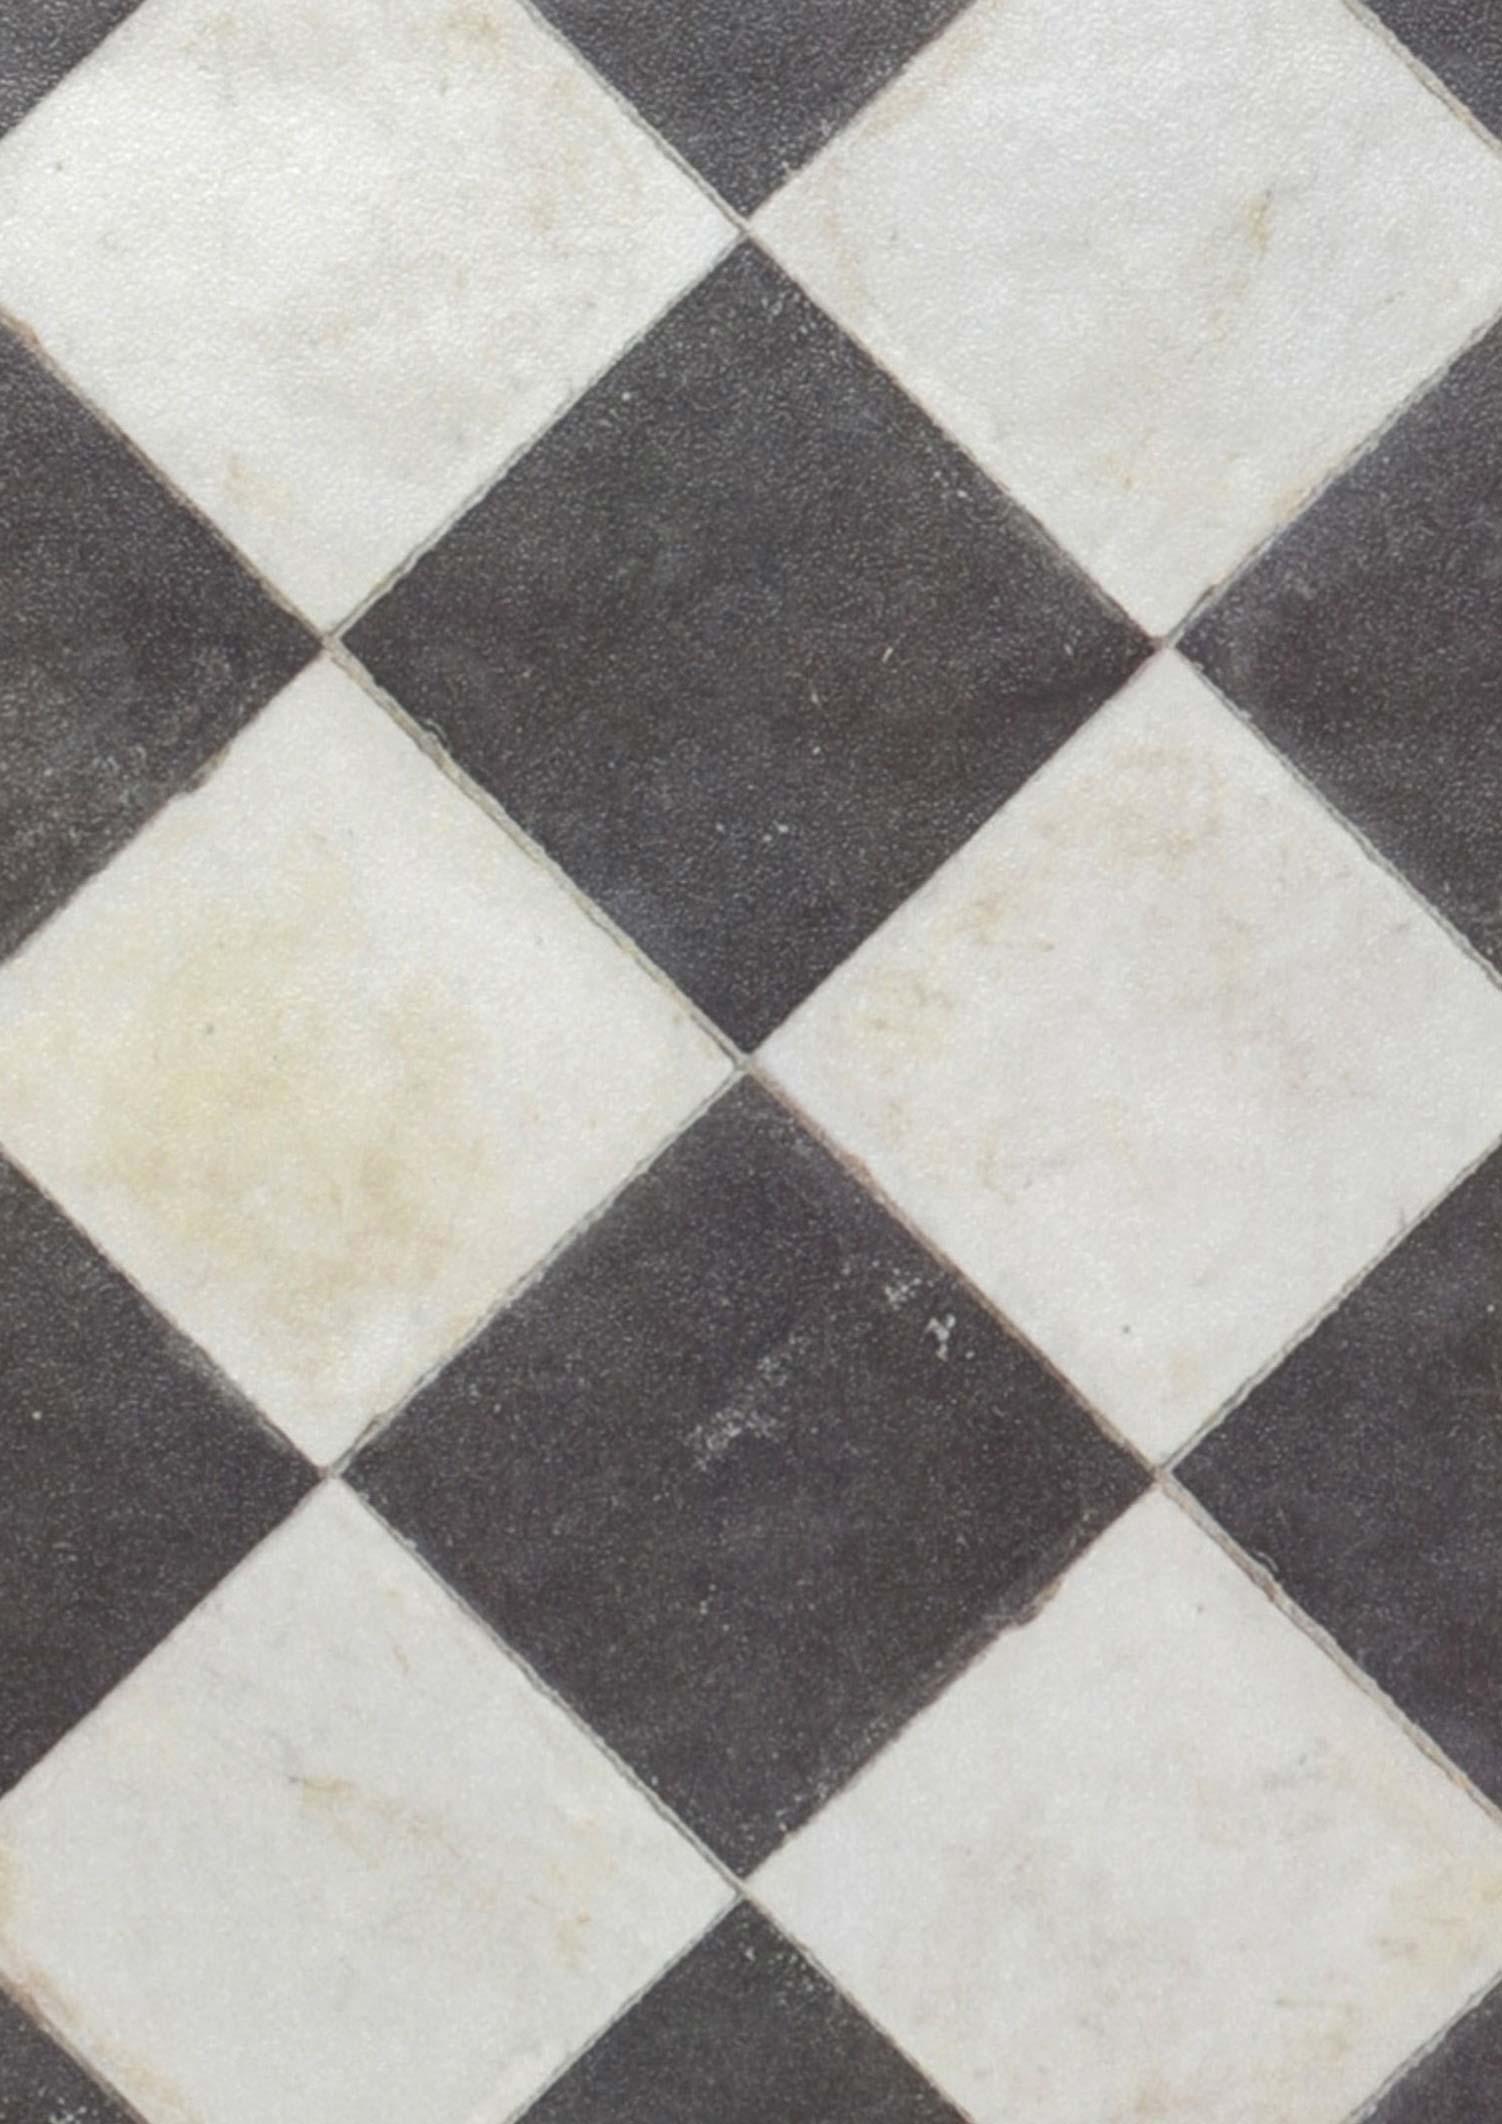 tapete marbel chess grauweiss schwarzbraun tapeten der 70er. Black Bedroom Furniture Sets. Home Design Ideas